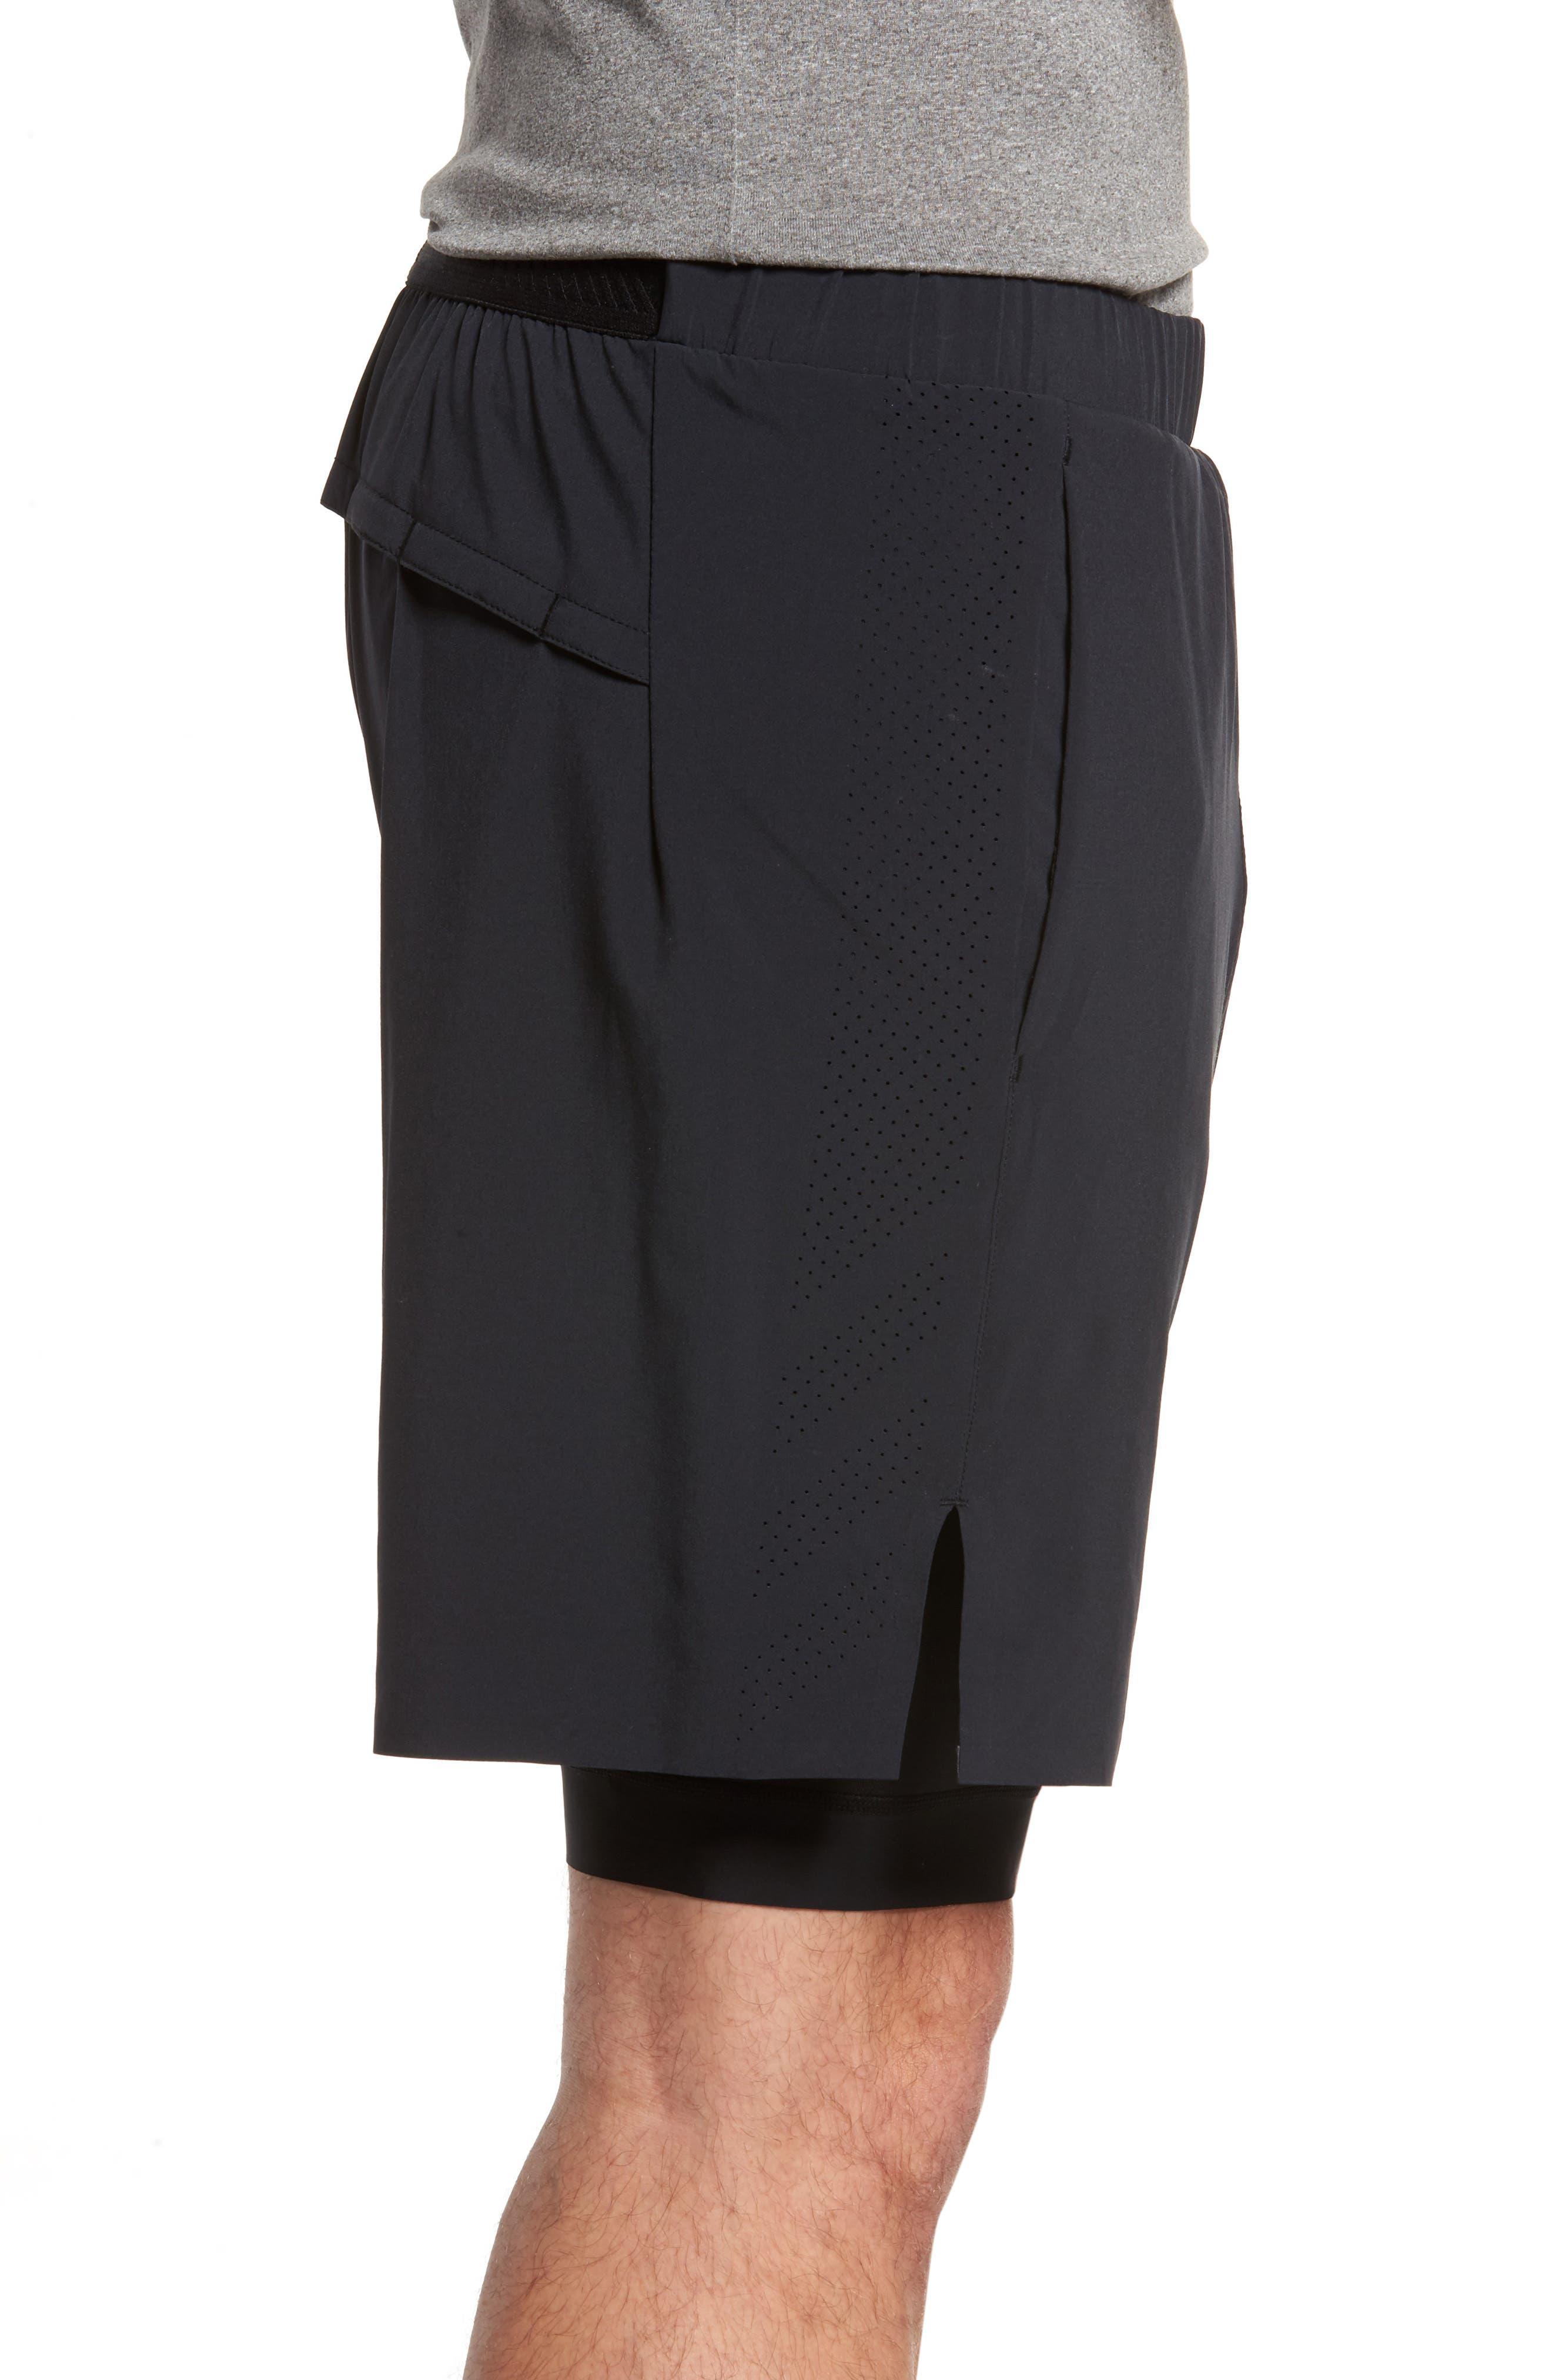 Interval 2-in-1 Shorts,                             Alternate thumbnail 3, color,                             Black